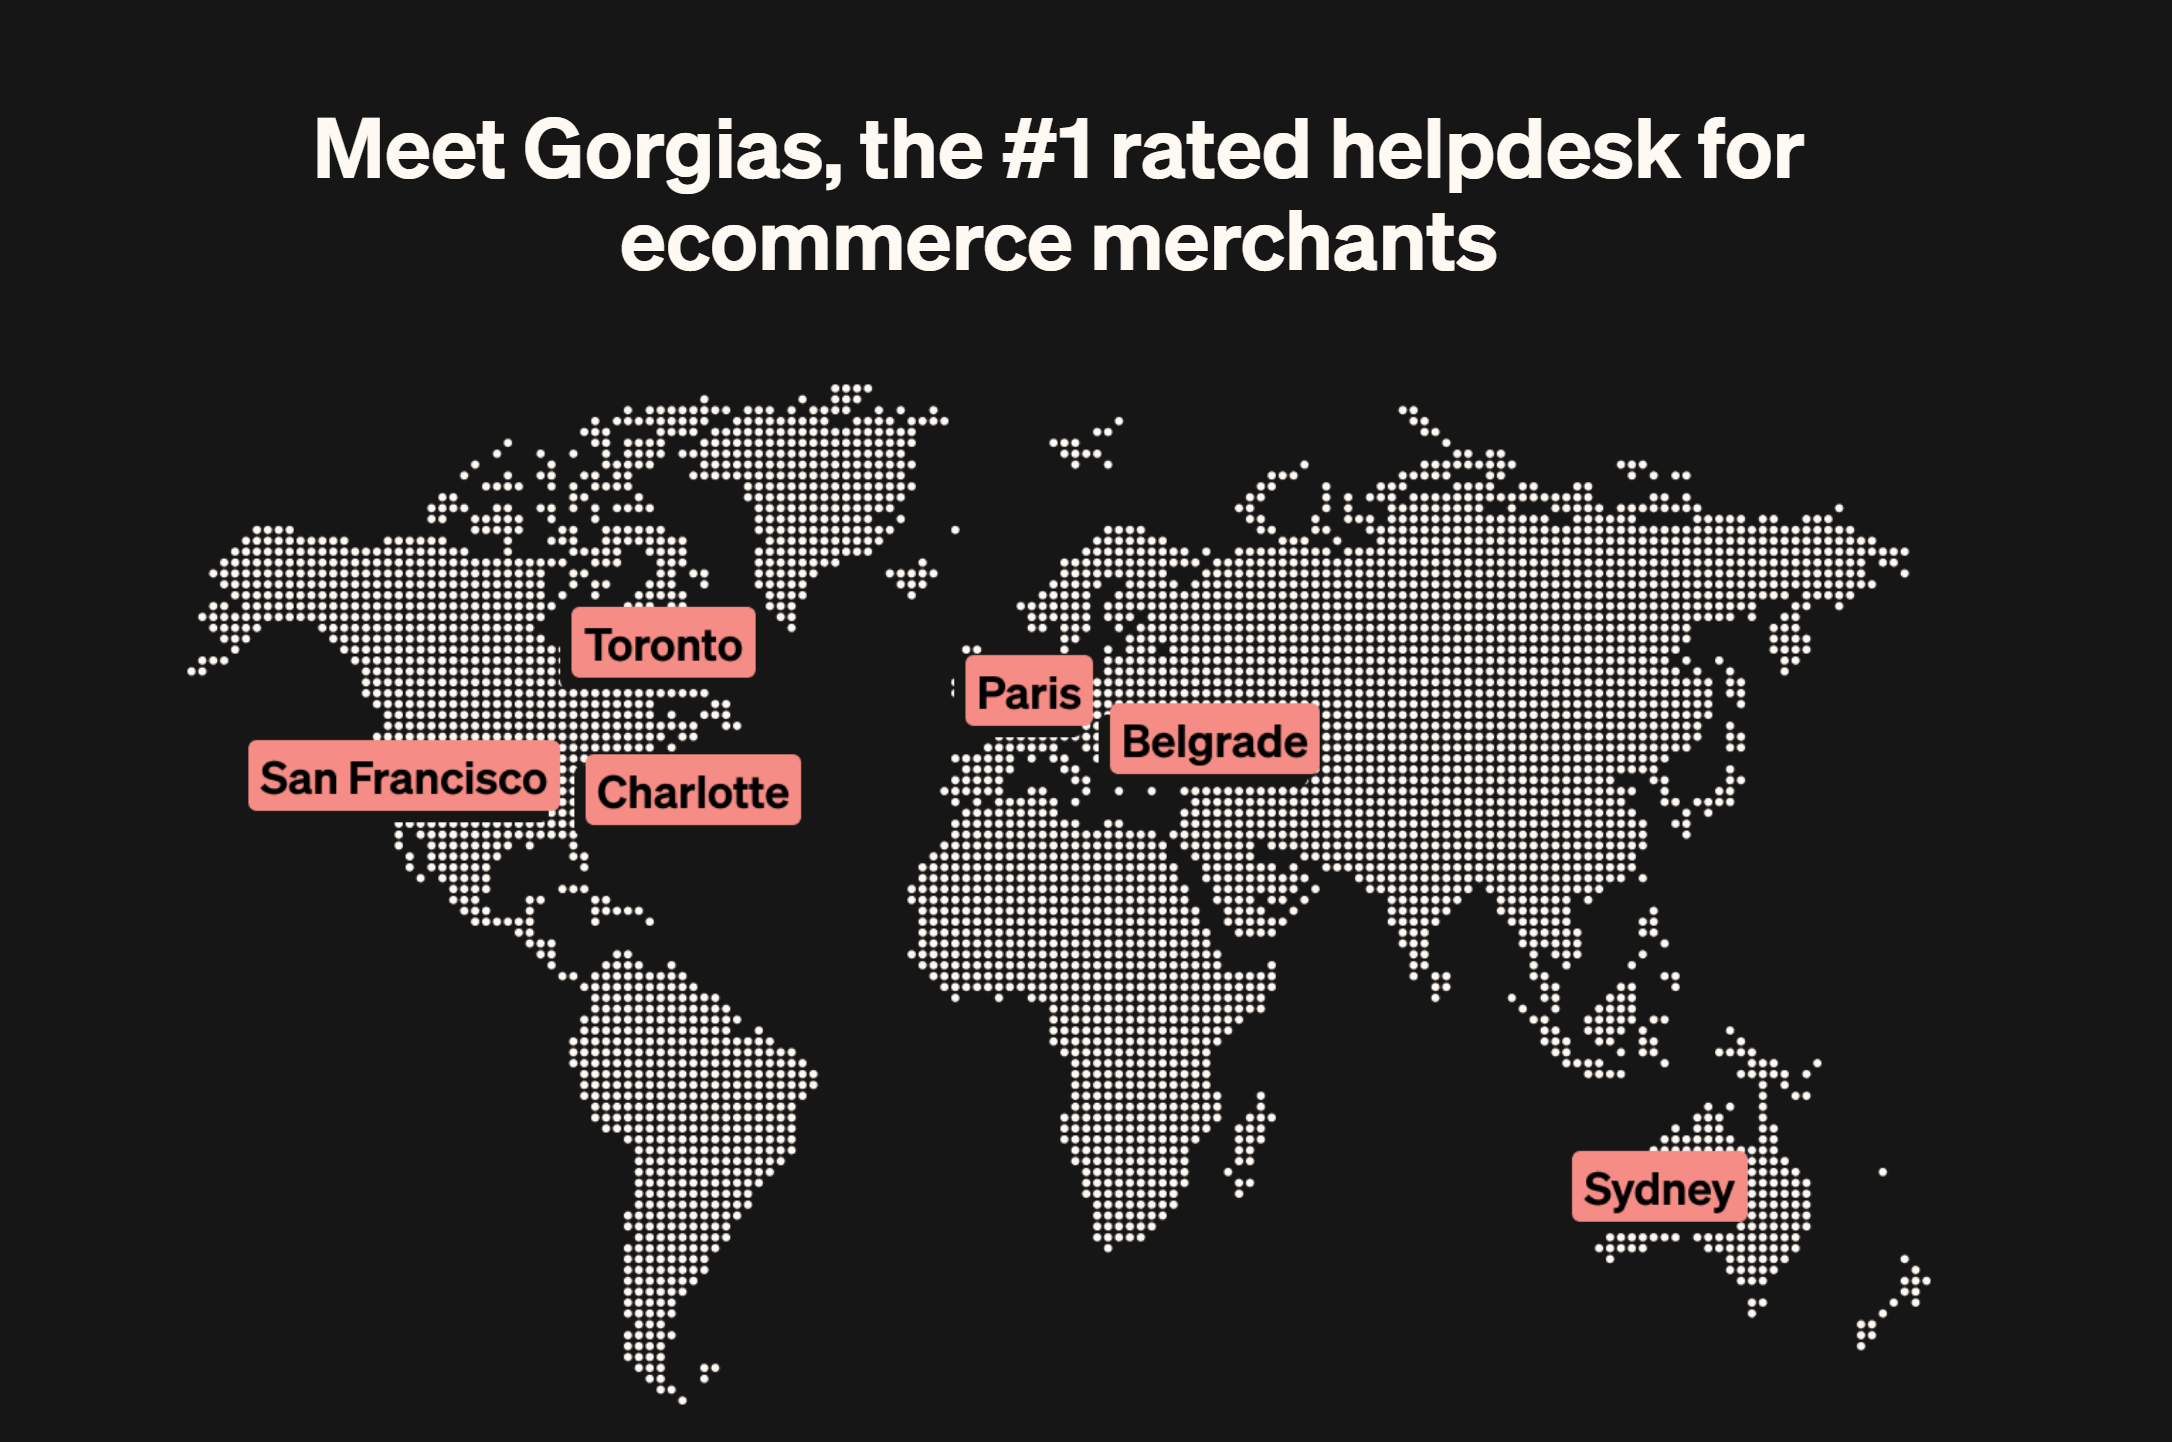 Gorgias helpdesk for ecommerce merchants